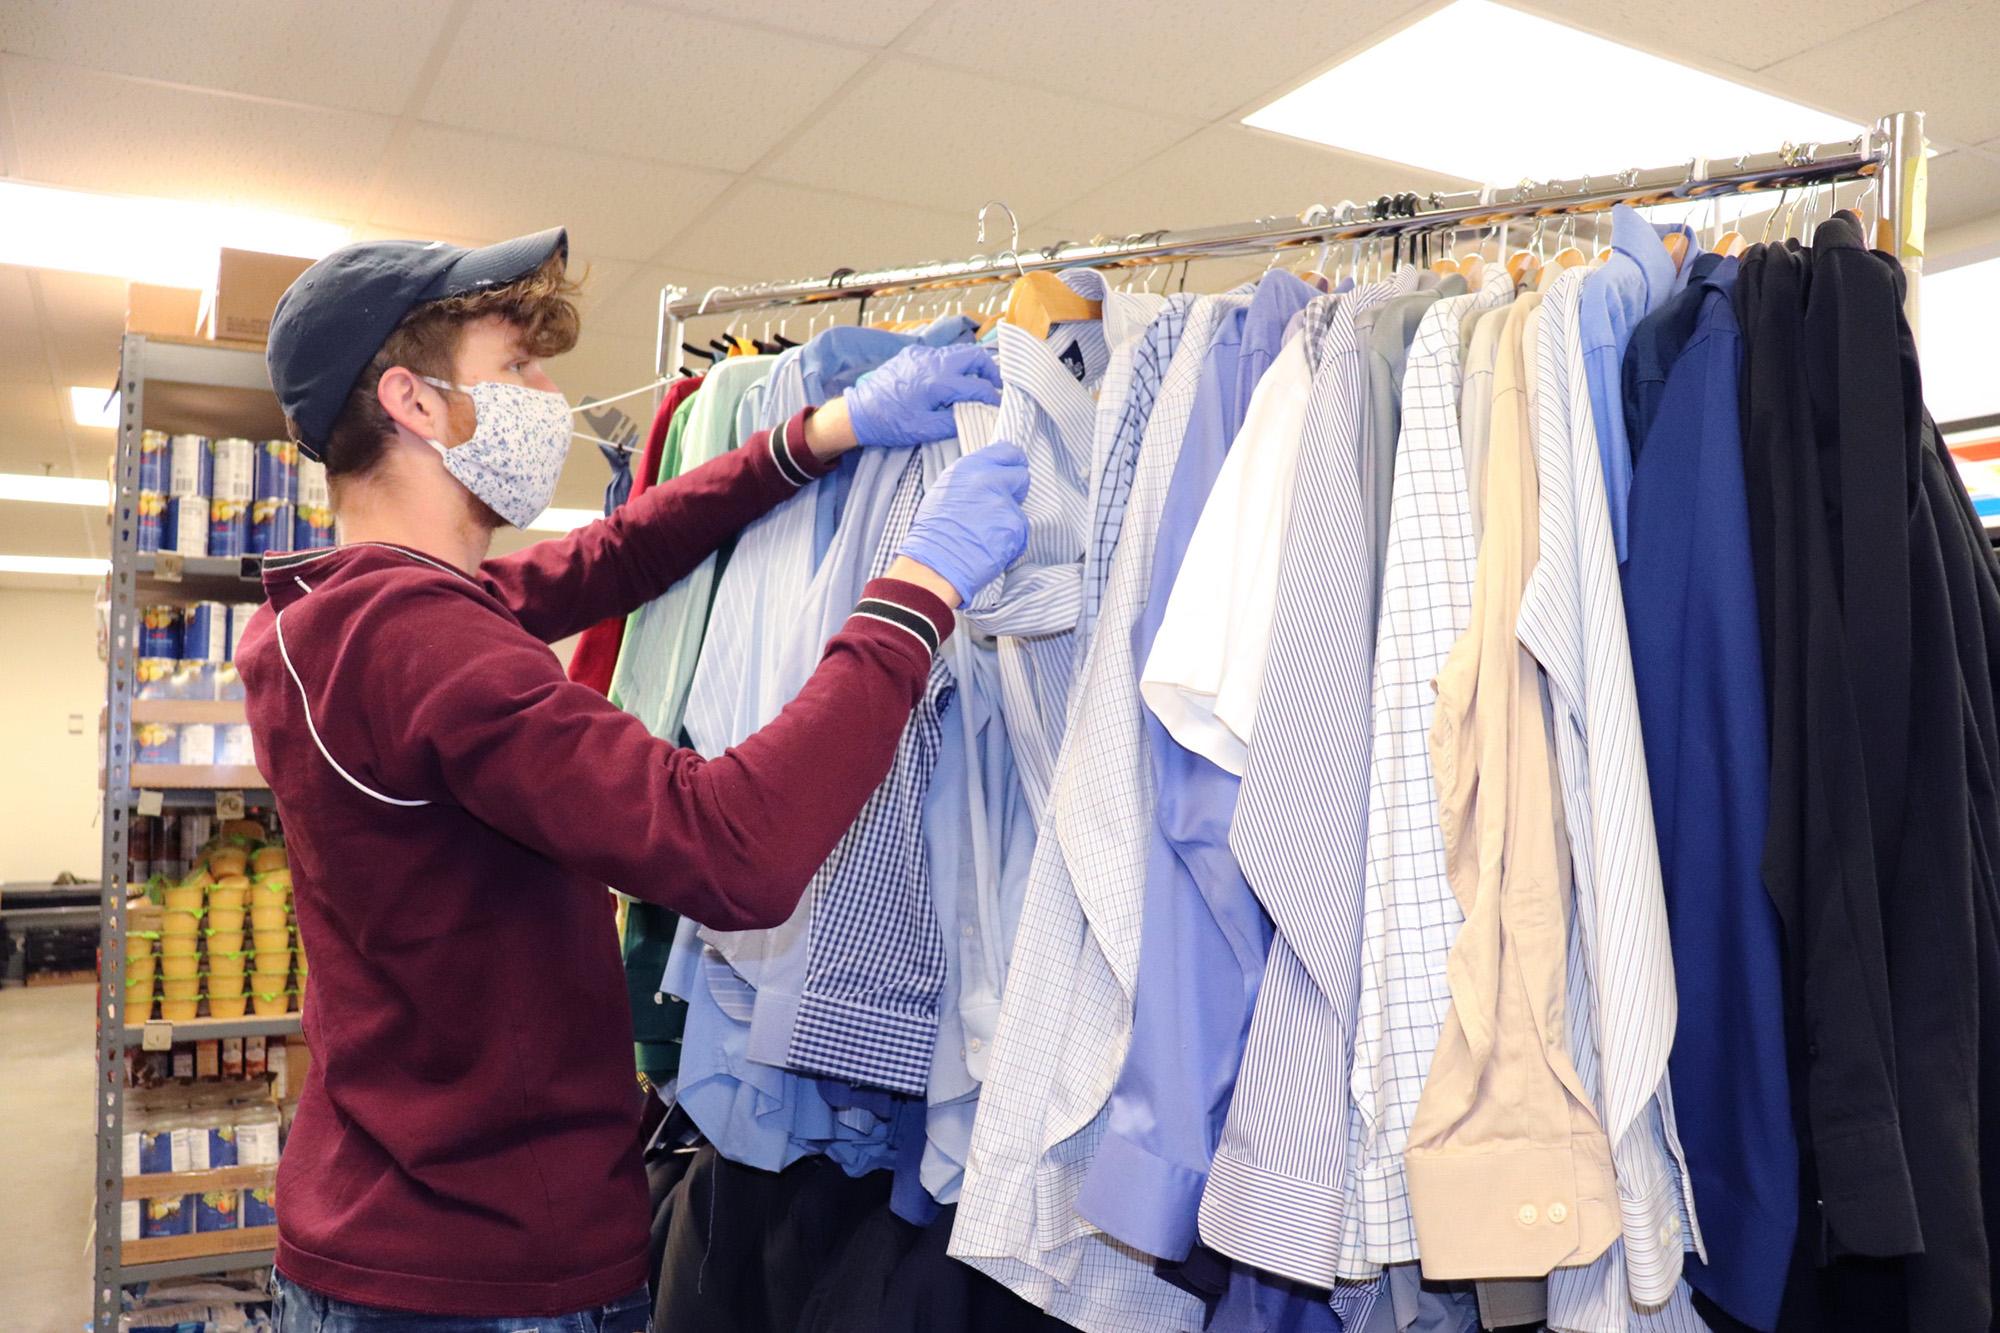 man pulling a dress shirt from a rack